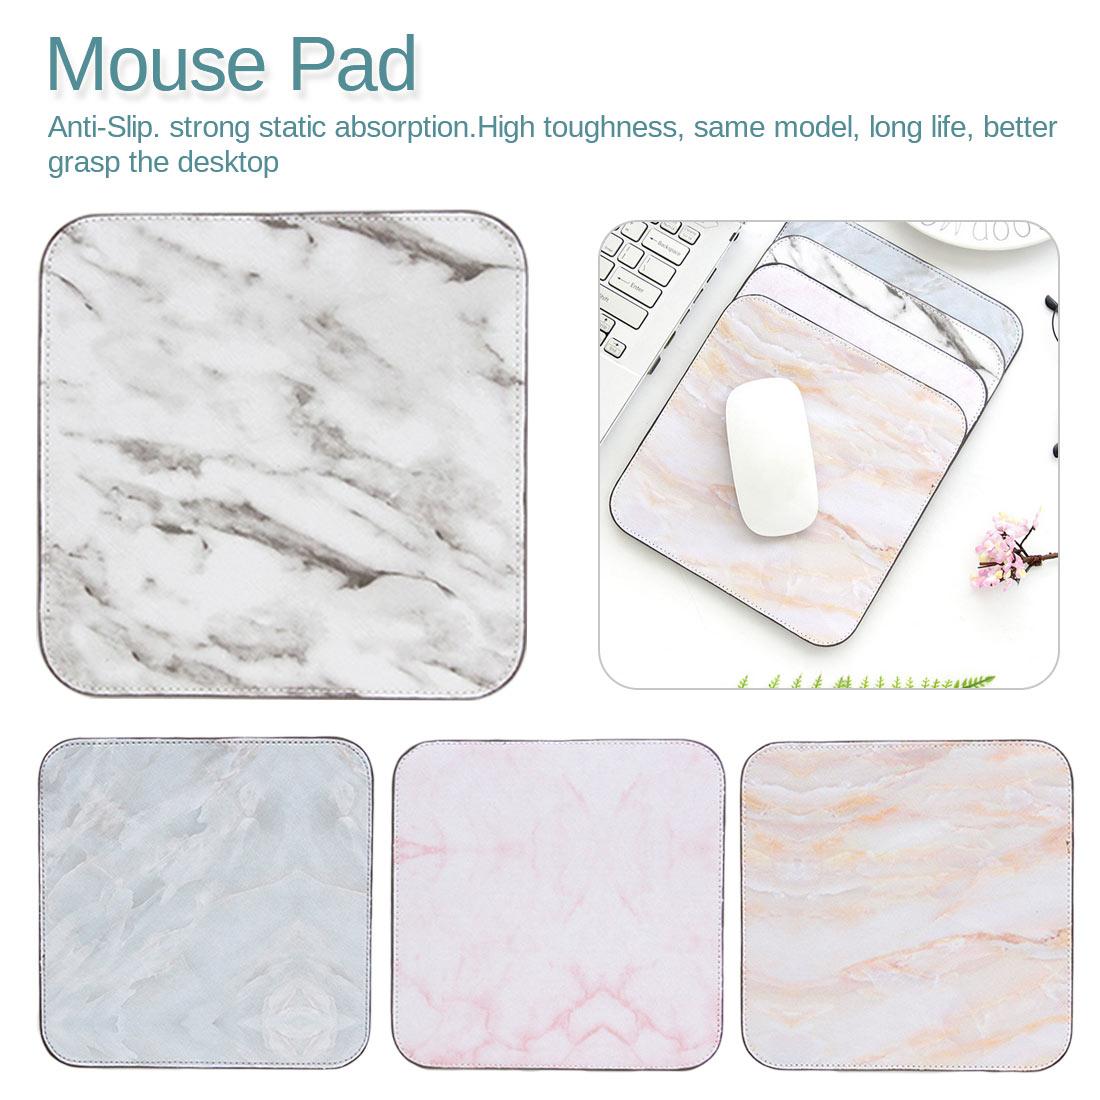 Desk Organizer School Supplies Desk Marble Mouse Mat Set Office Tools Office Desk Accessories